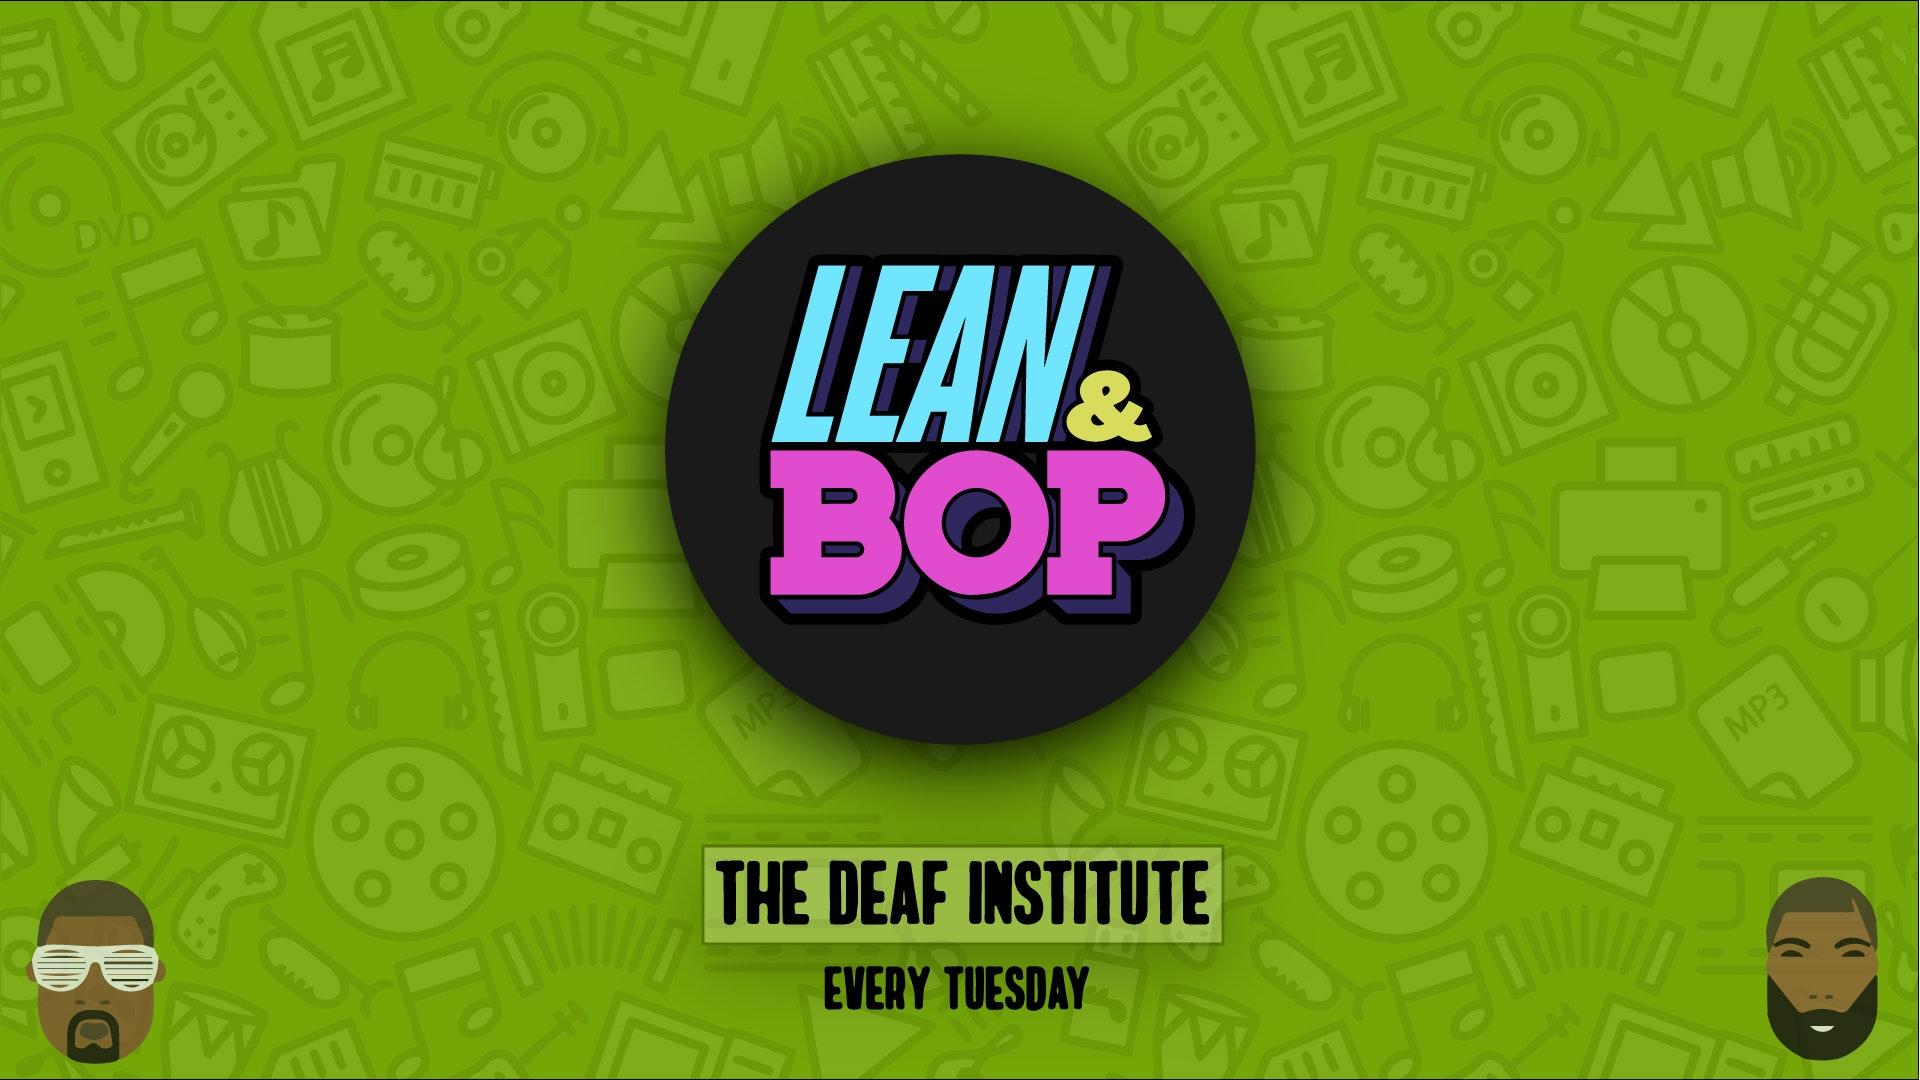 Lean & Bop – Grimelords